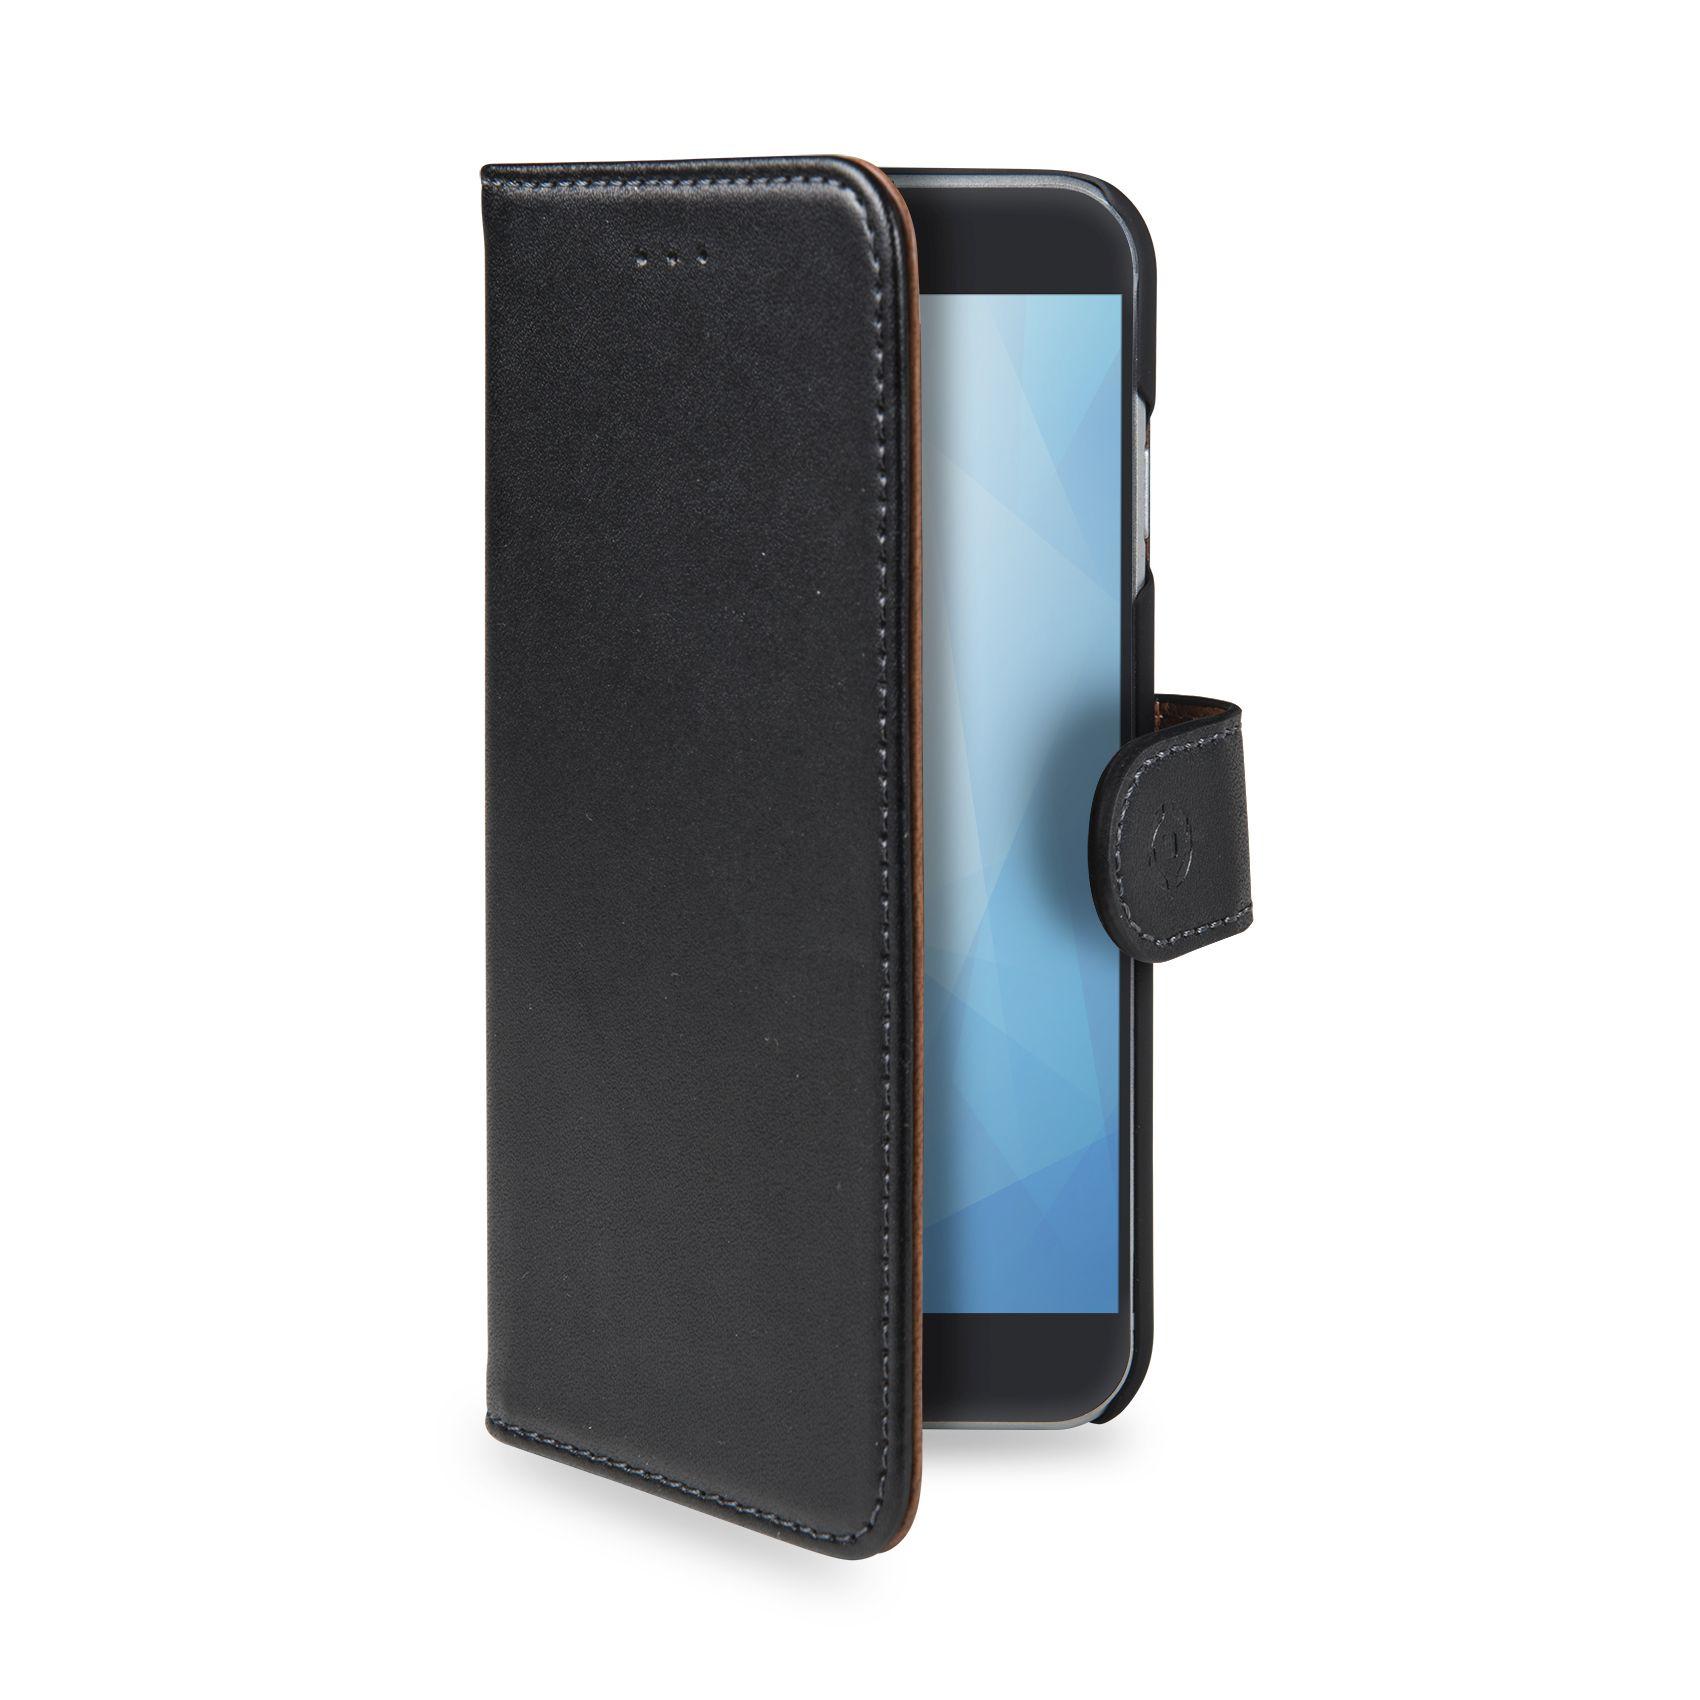 Pouzdro typu kniha Wallet Nokia 7 Plus, černé